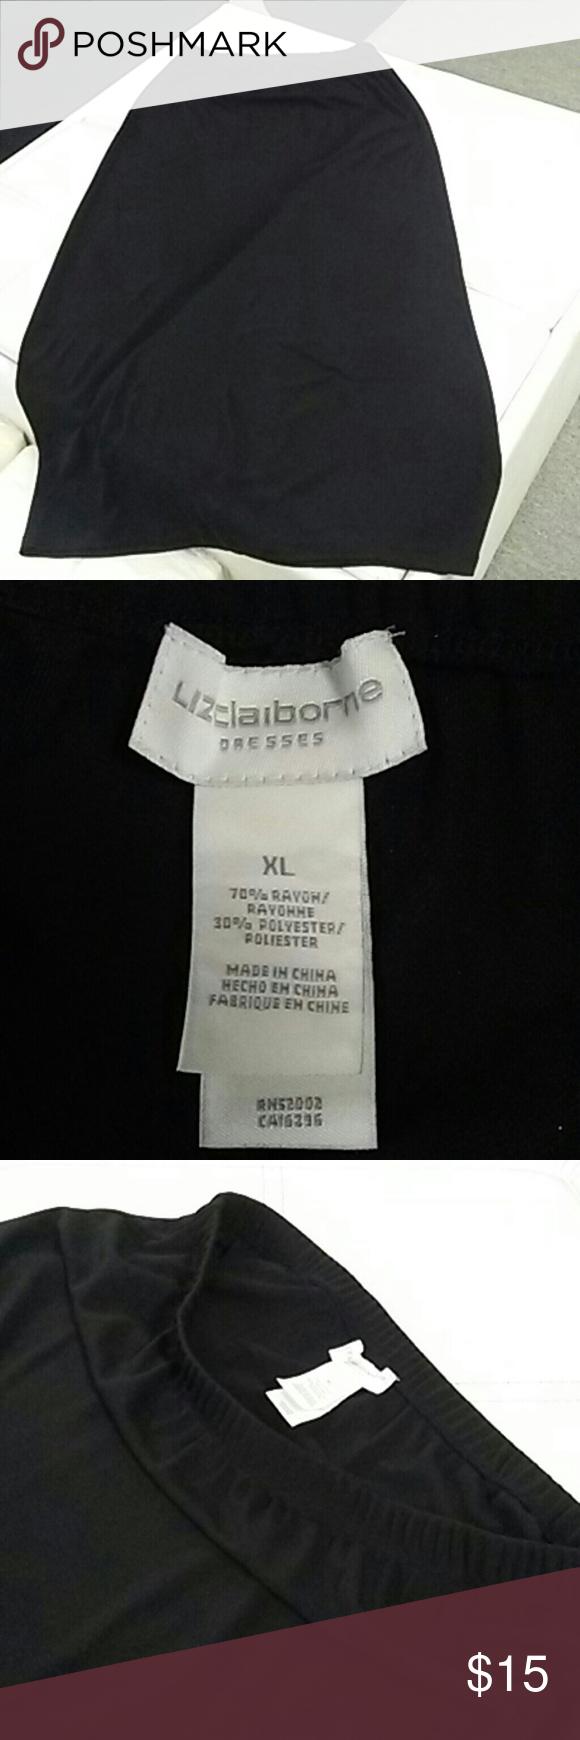 1pc Black skirt..39inches long 1pc Black skirt 70% rayon 30% polyester Liz Claiborne Skirts Midi